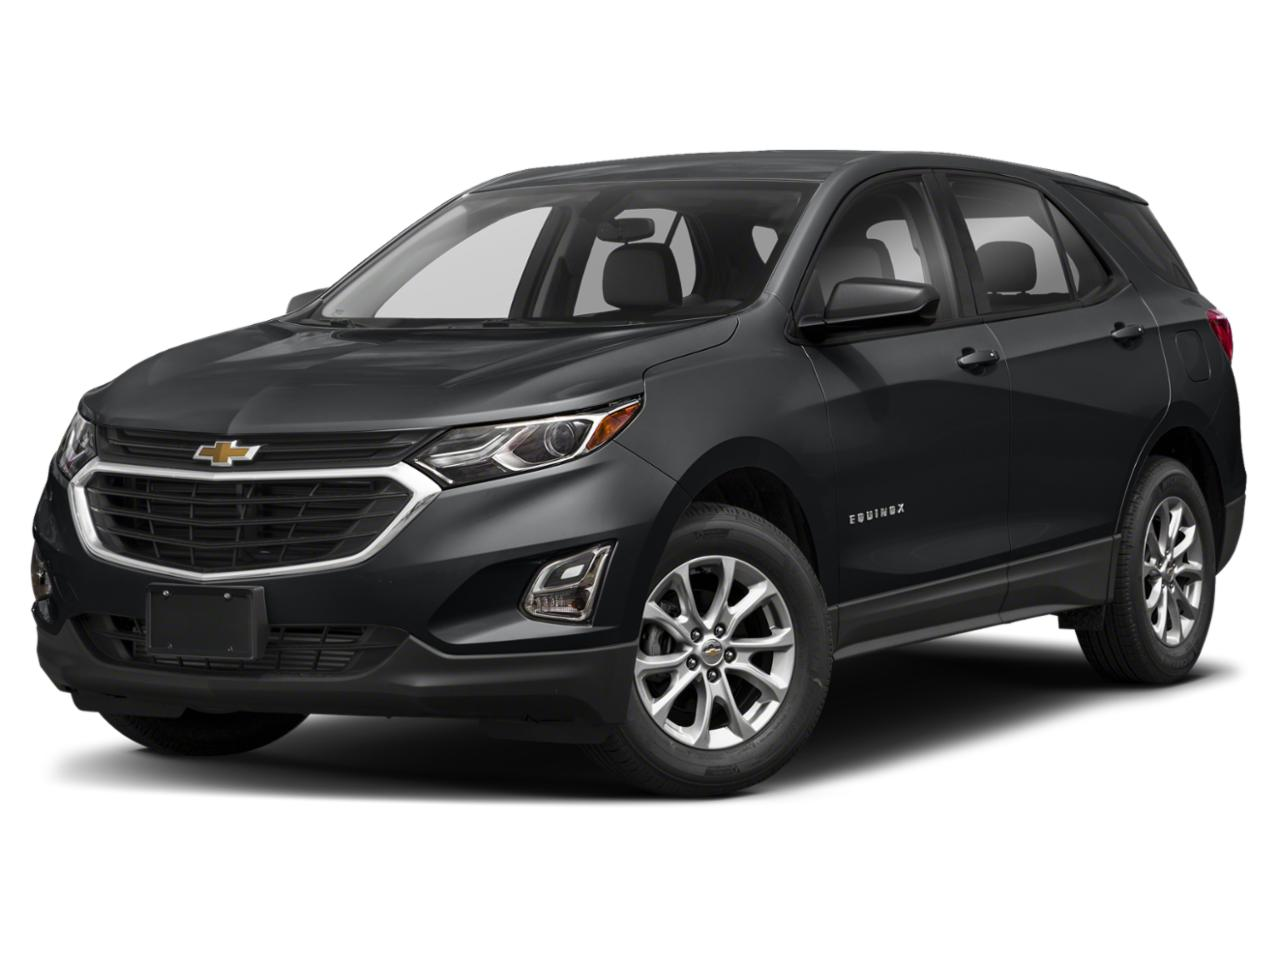 2018 Chevrolet Equinox Vehicle Photo in GARDNER, MA 01440-3110